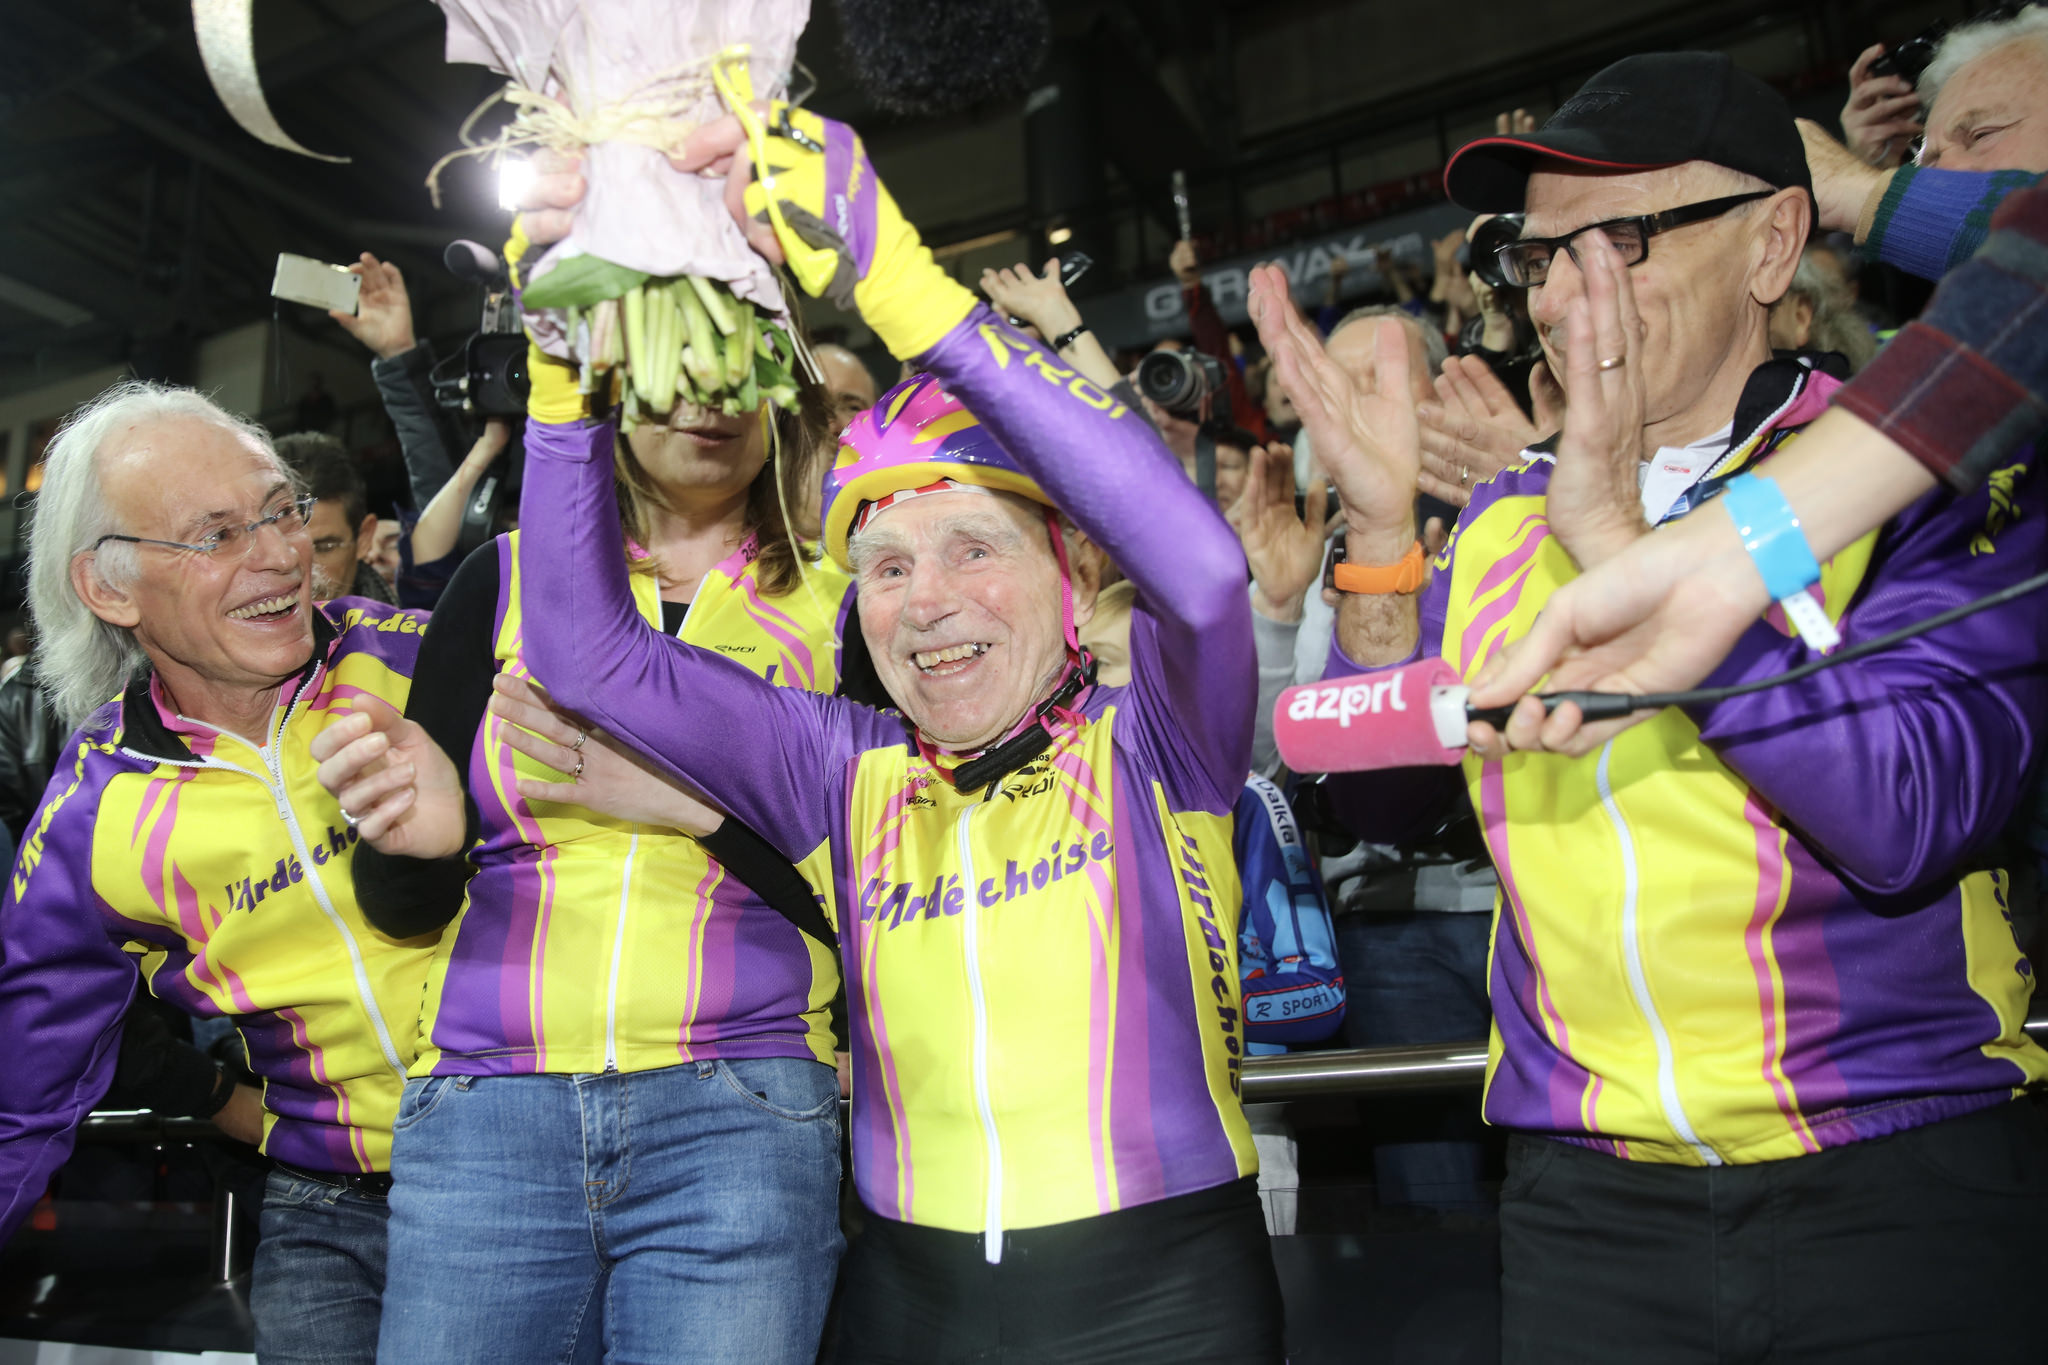 Robert Marchand il ciclista centenario